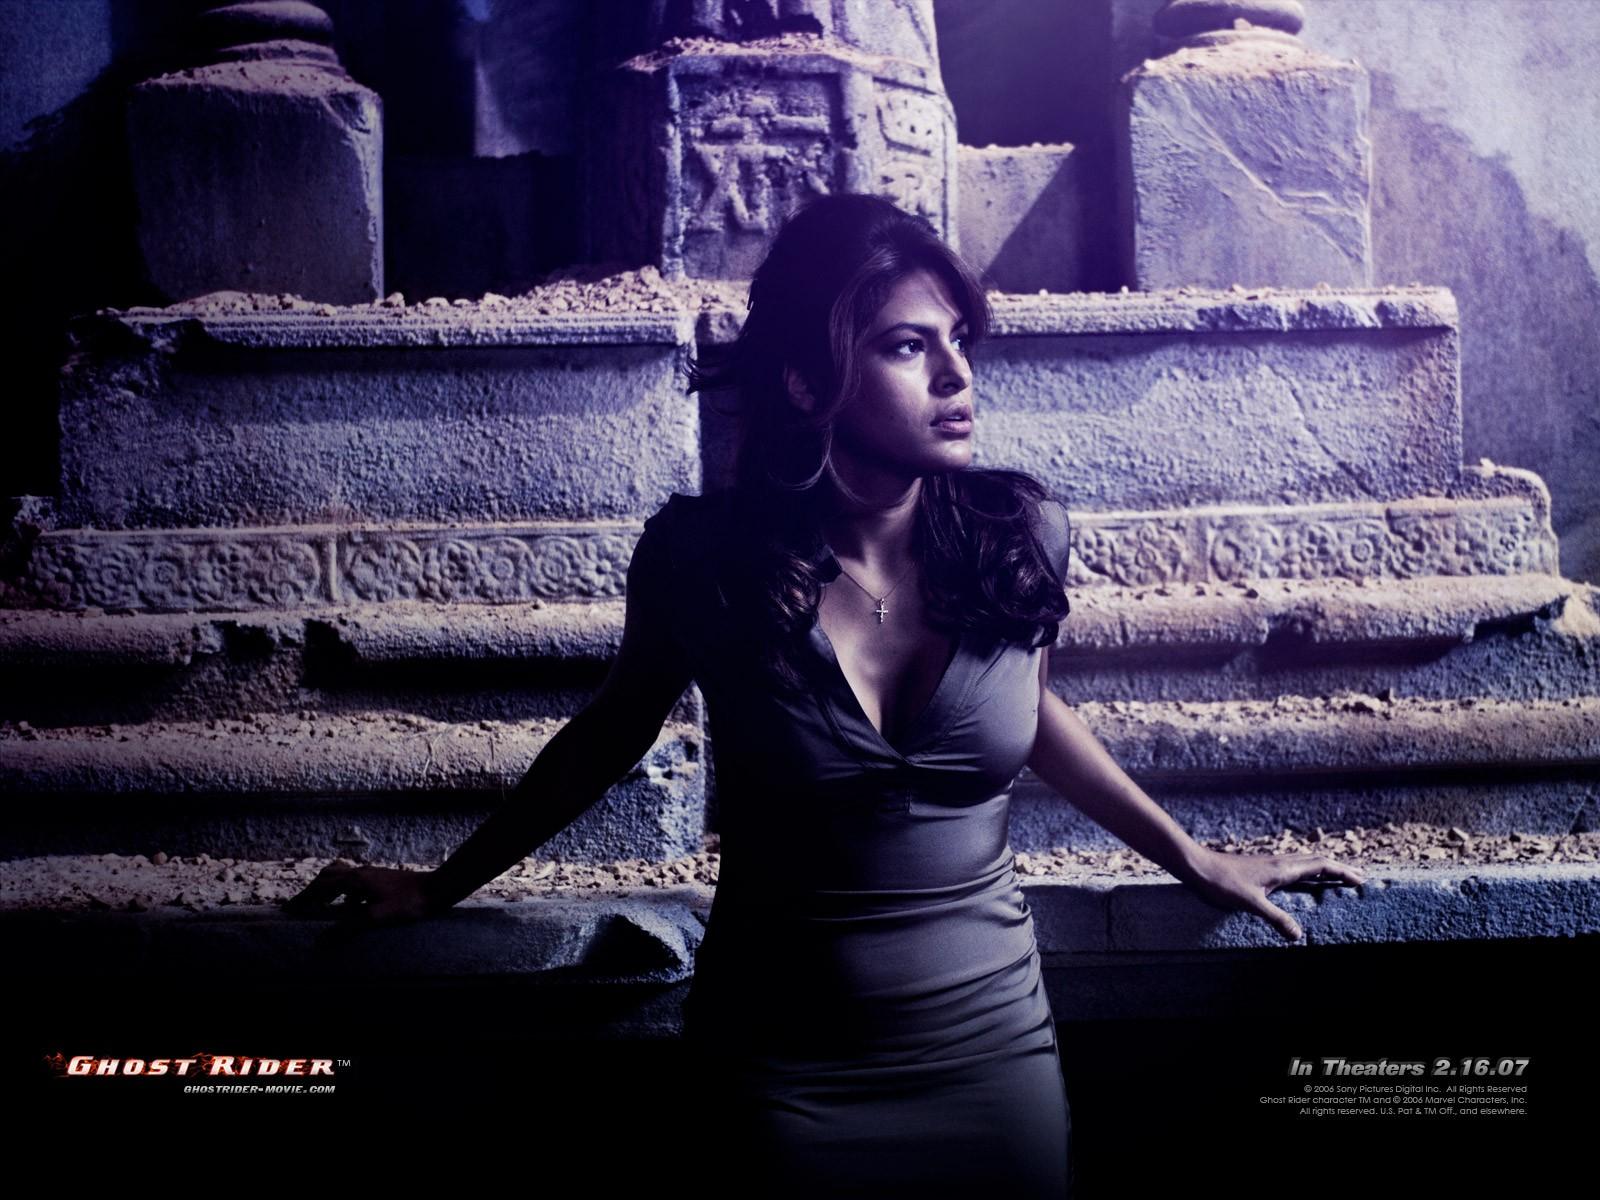 Movie wallpapers - Ghost Rider - BERITA HARIAN ONLINE